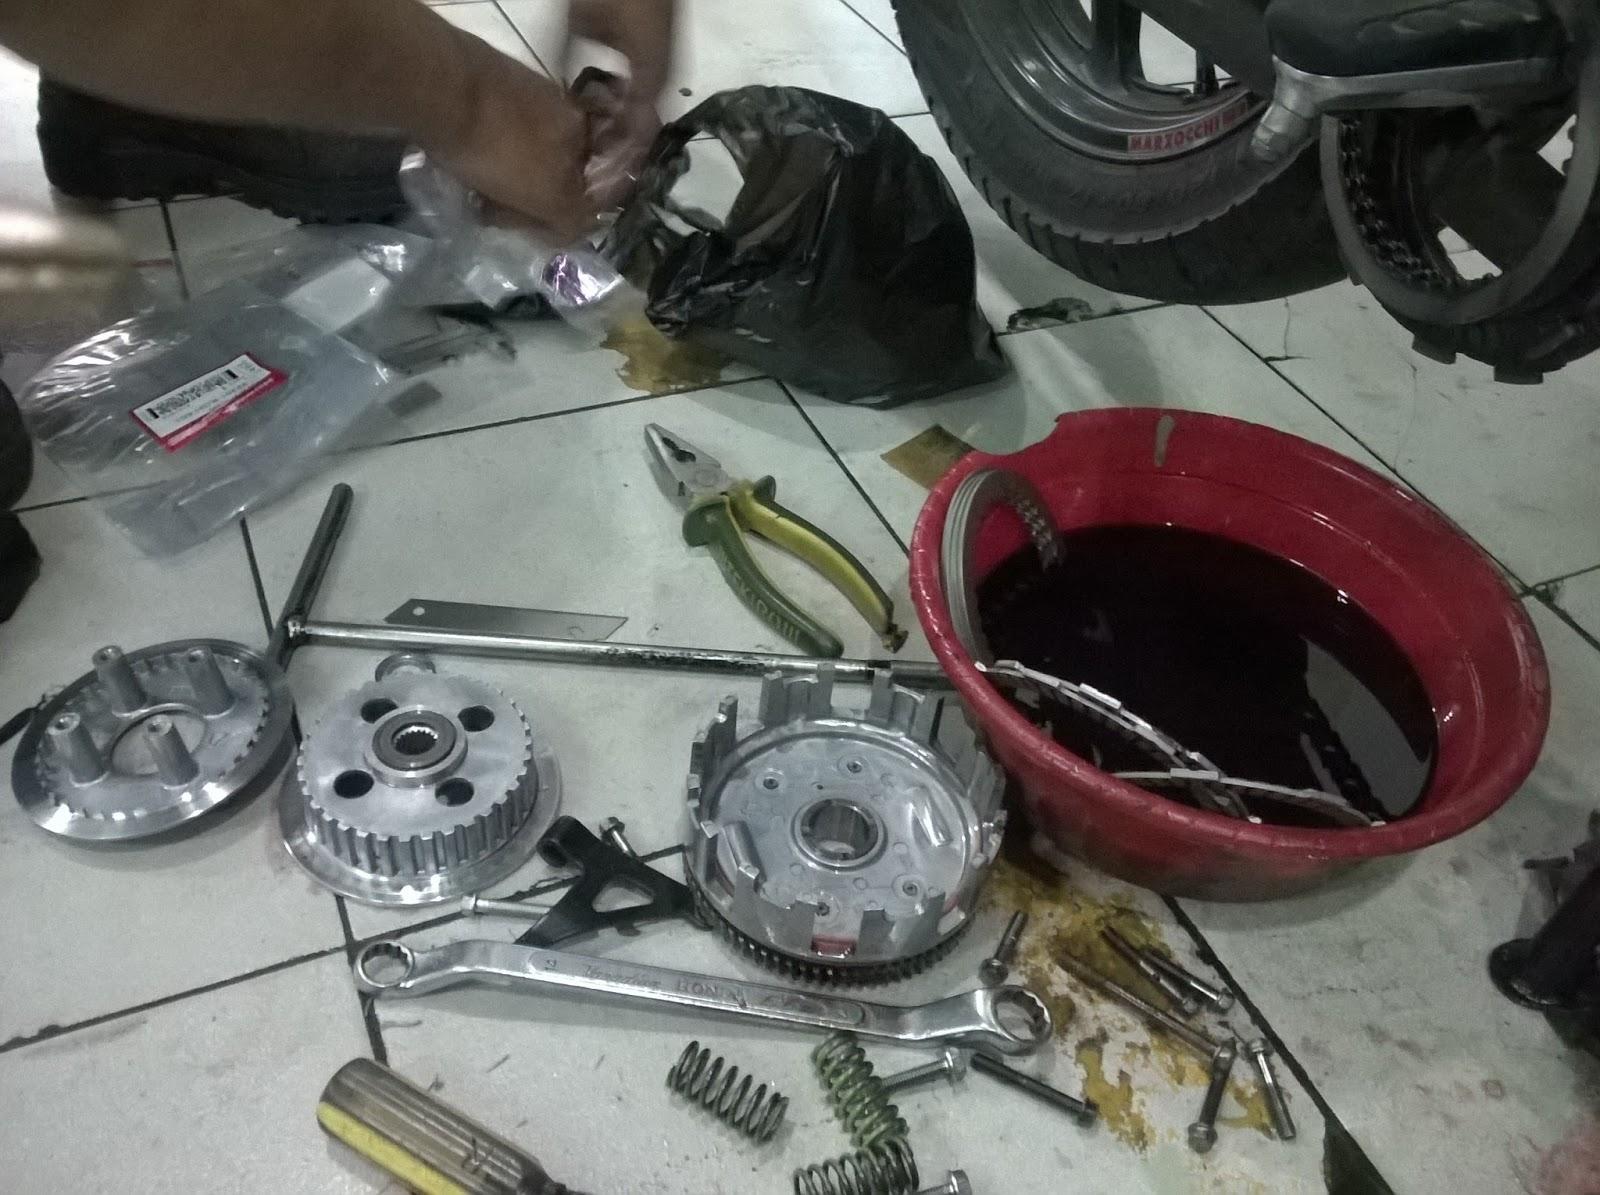 Motorchanblog Problem Solved Kini Honda Cb150r Nggak Ndut Ndutan Plat Kopling Besi Gl Tiger Grand Cb Mega Pro Original Pemasangan Rumah Beserta Kanvas Dan Gesek